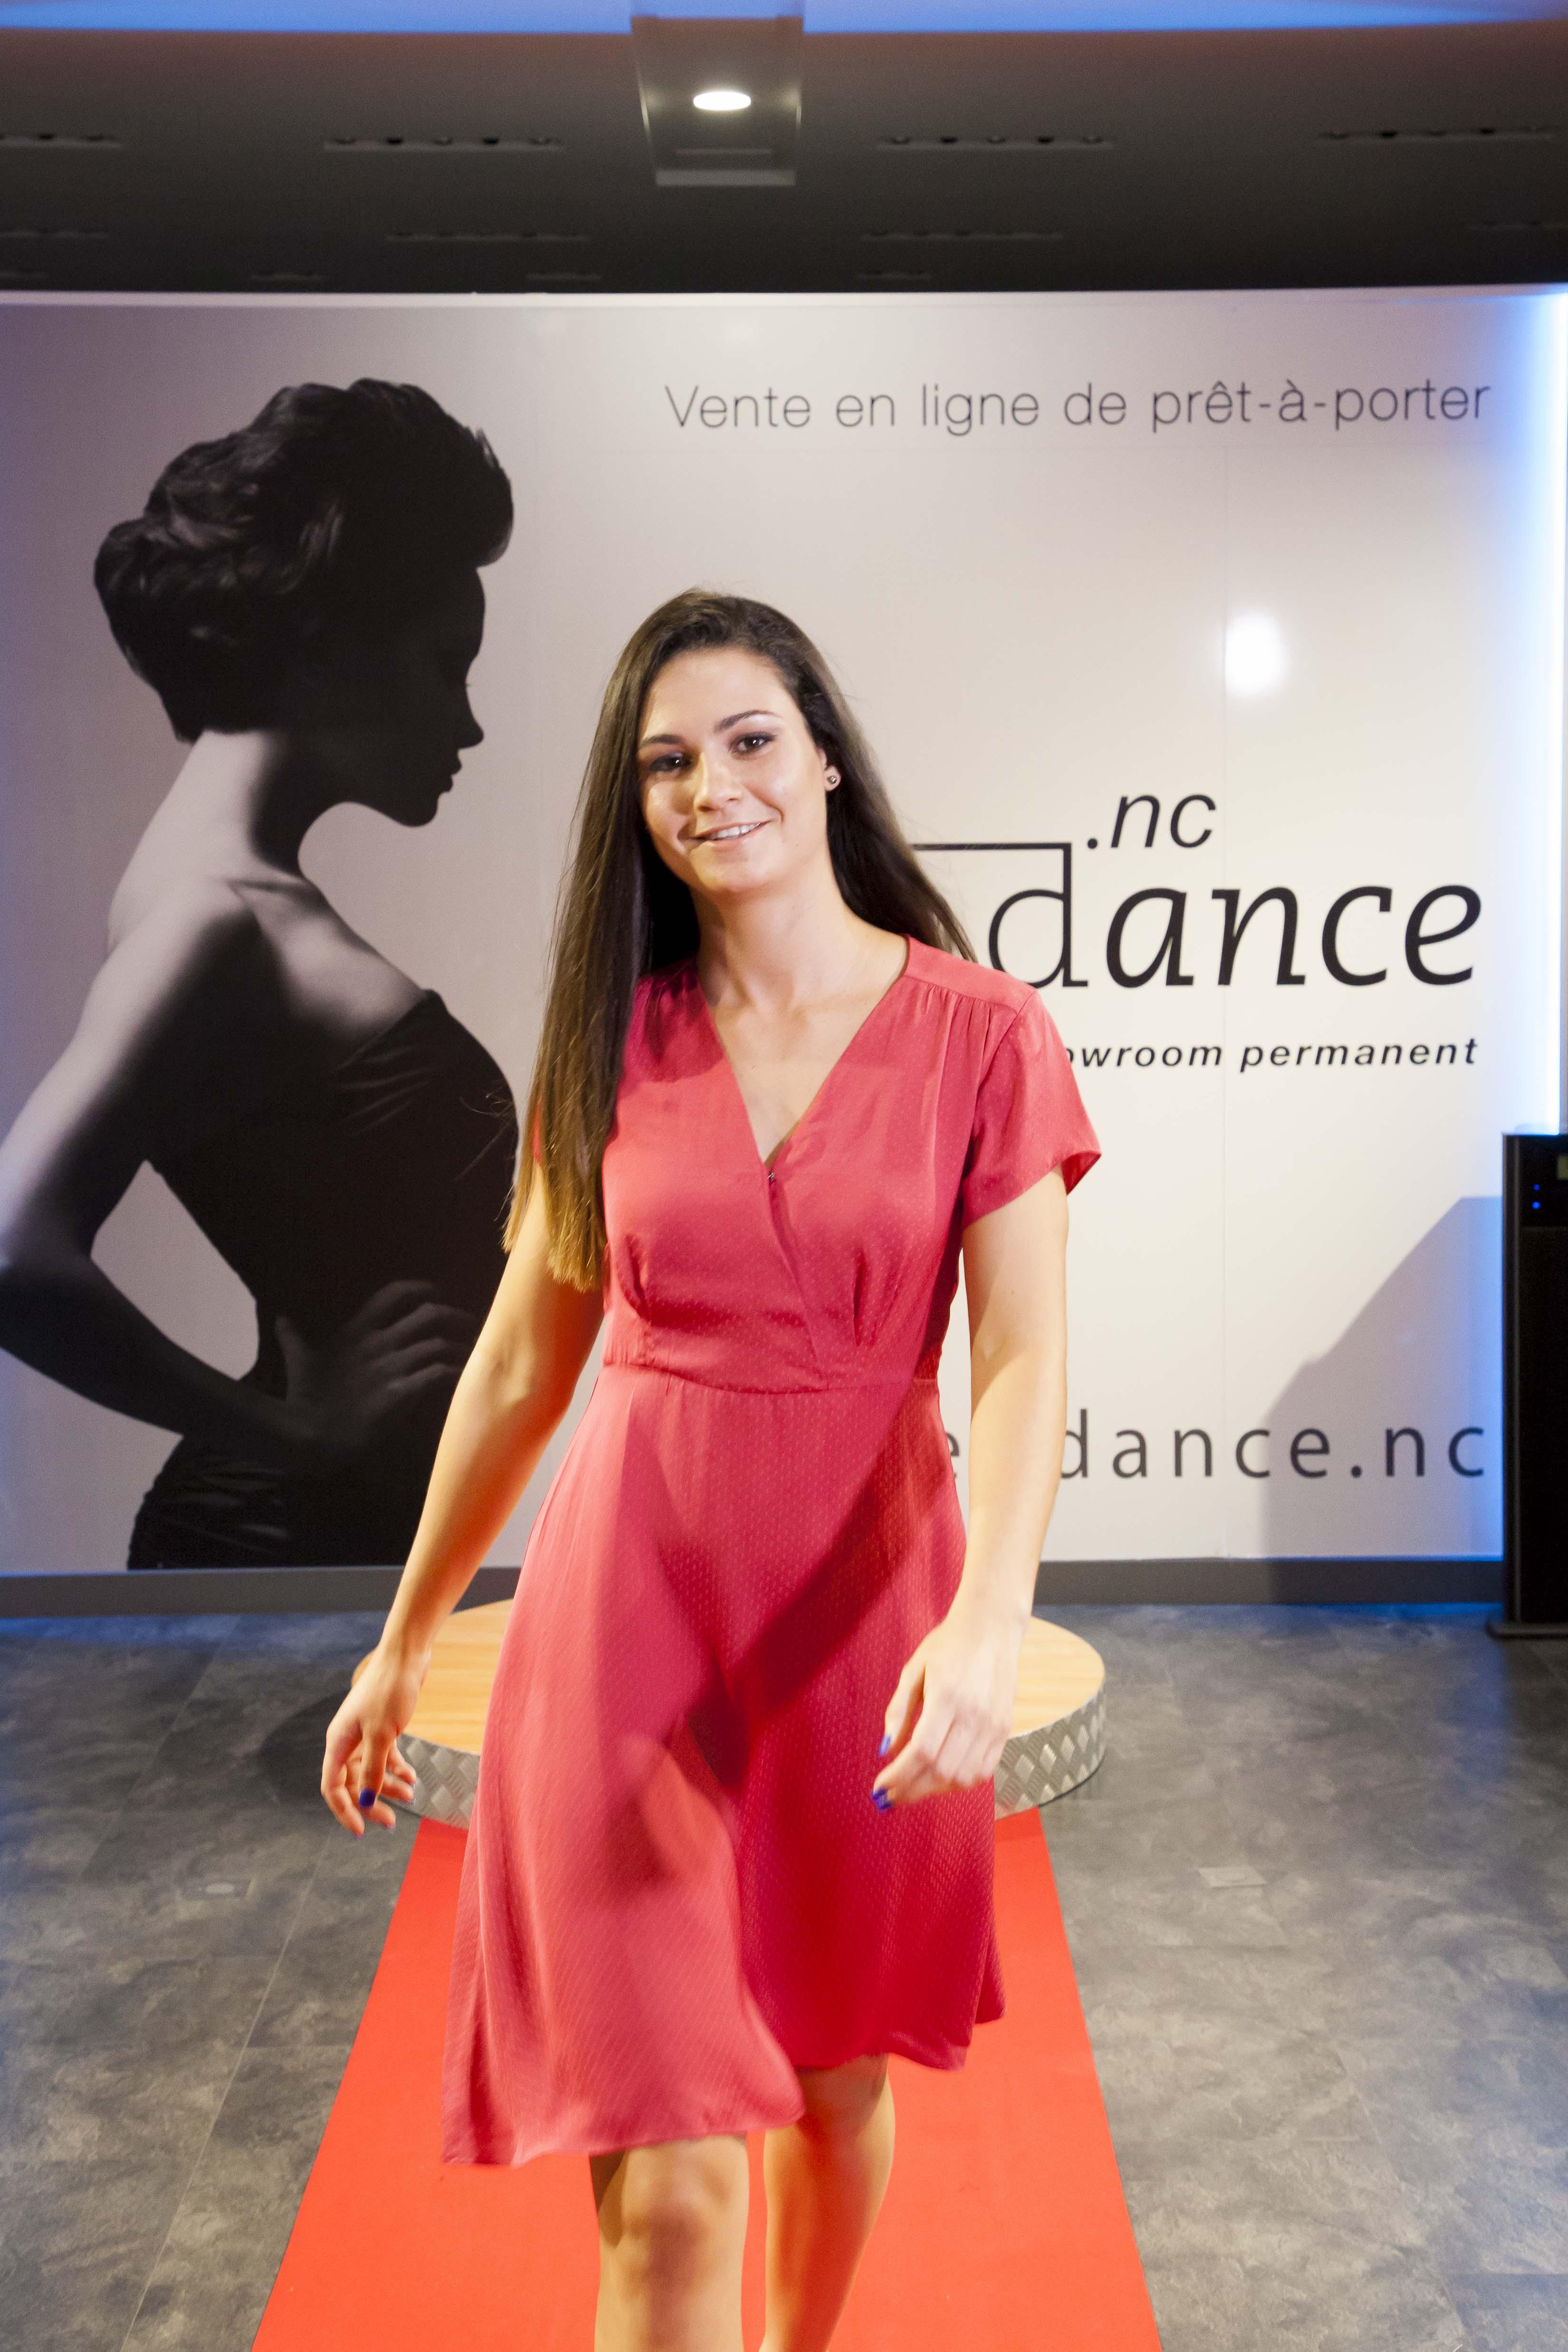 Tendance NC 2017 by Cissia Schippers photographe-8313